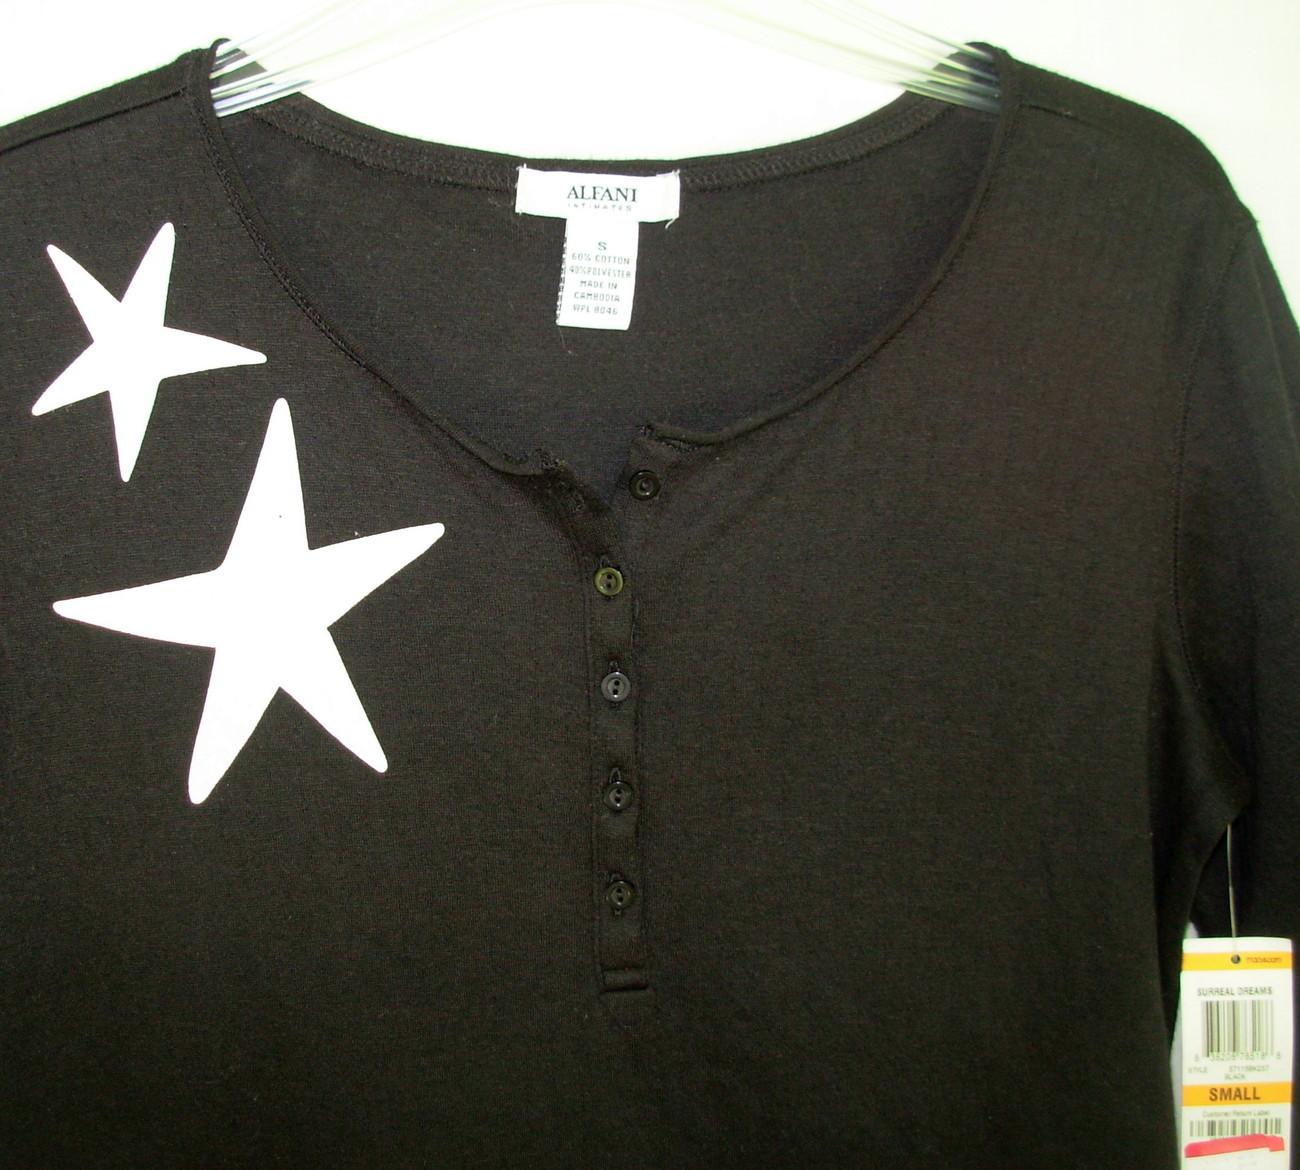 new ALFANI sz S Sleepshirt Nightgown Black w White stars deer Small cotton blend